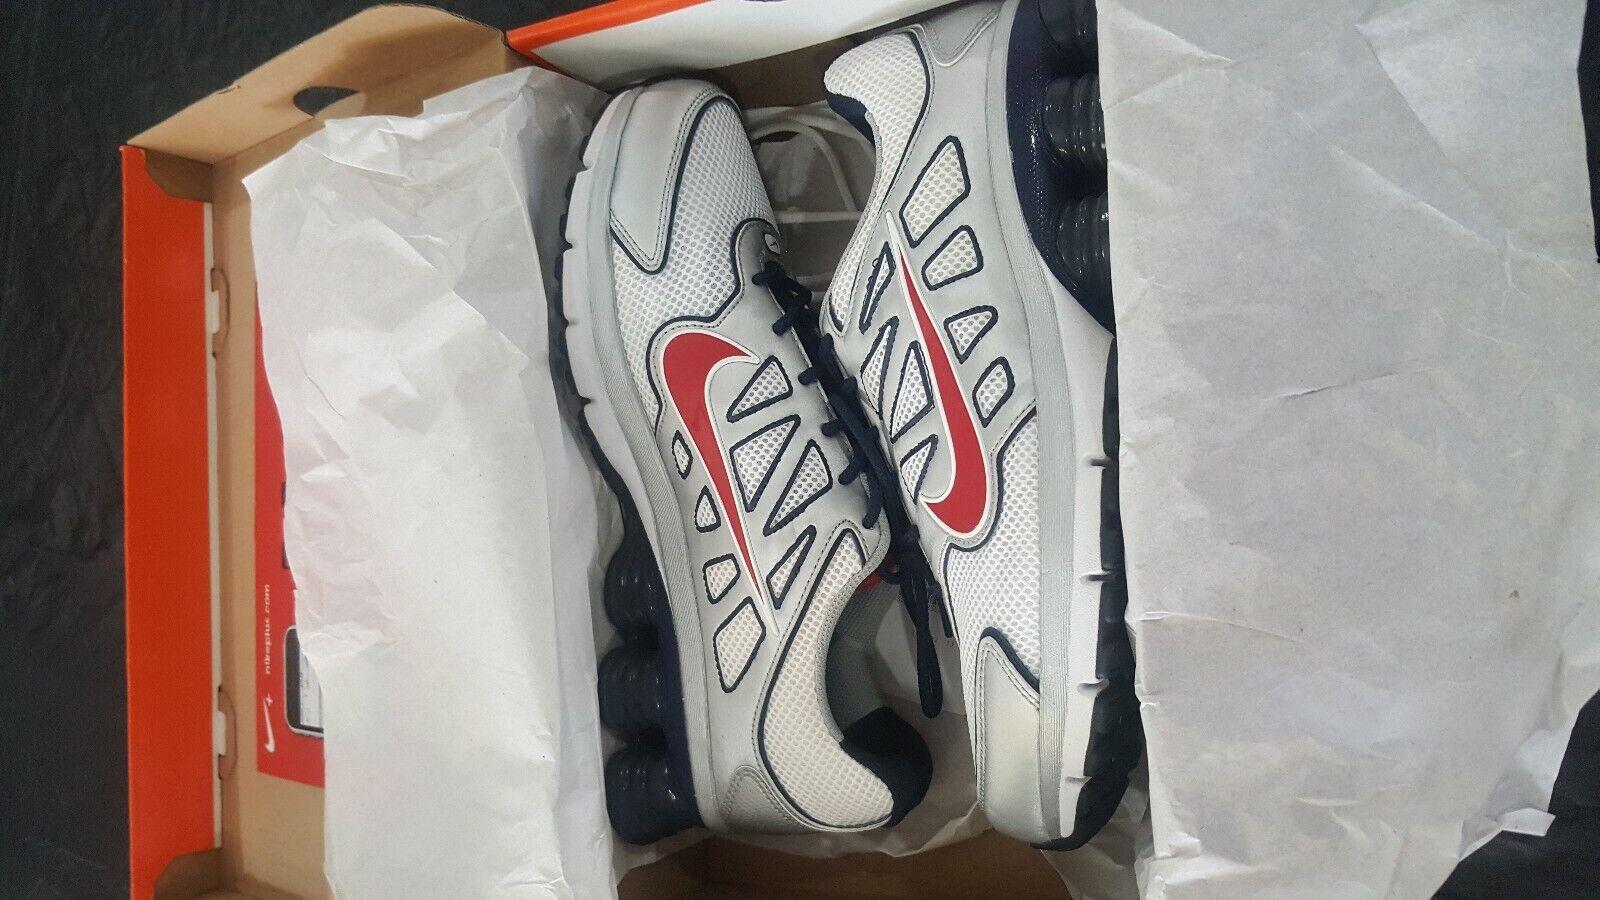 Nike Shox Kvalificera 2 Storlek 11.5